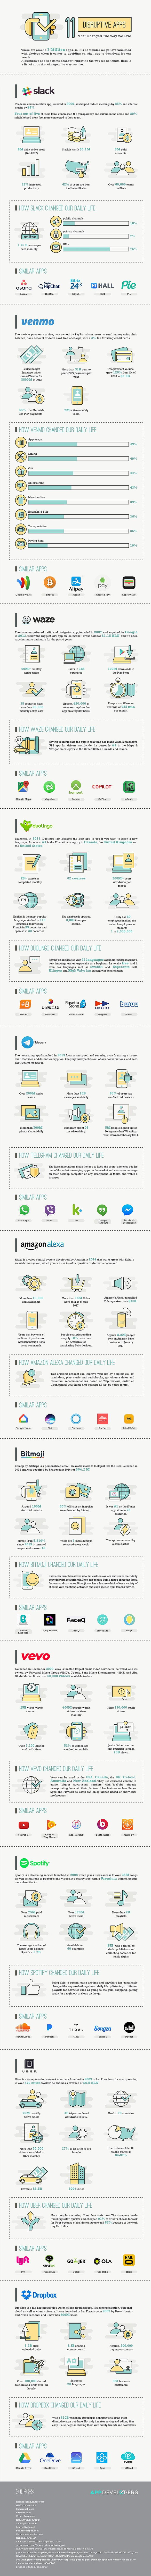 Infographics- MobileAppDaily